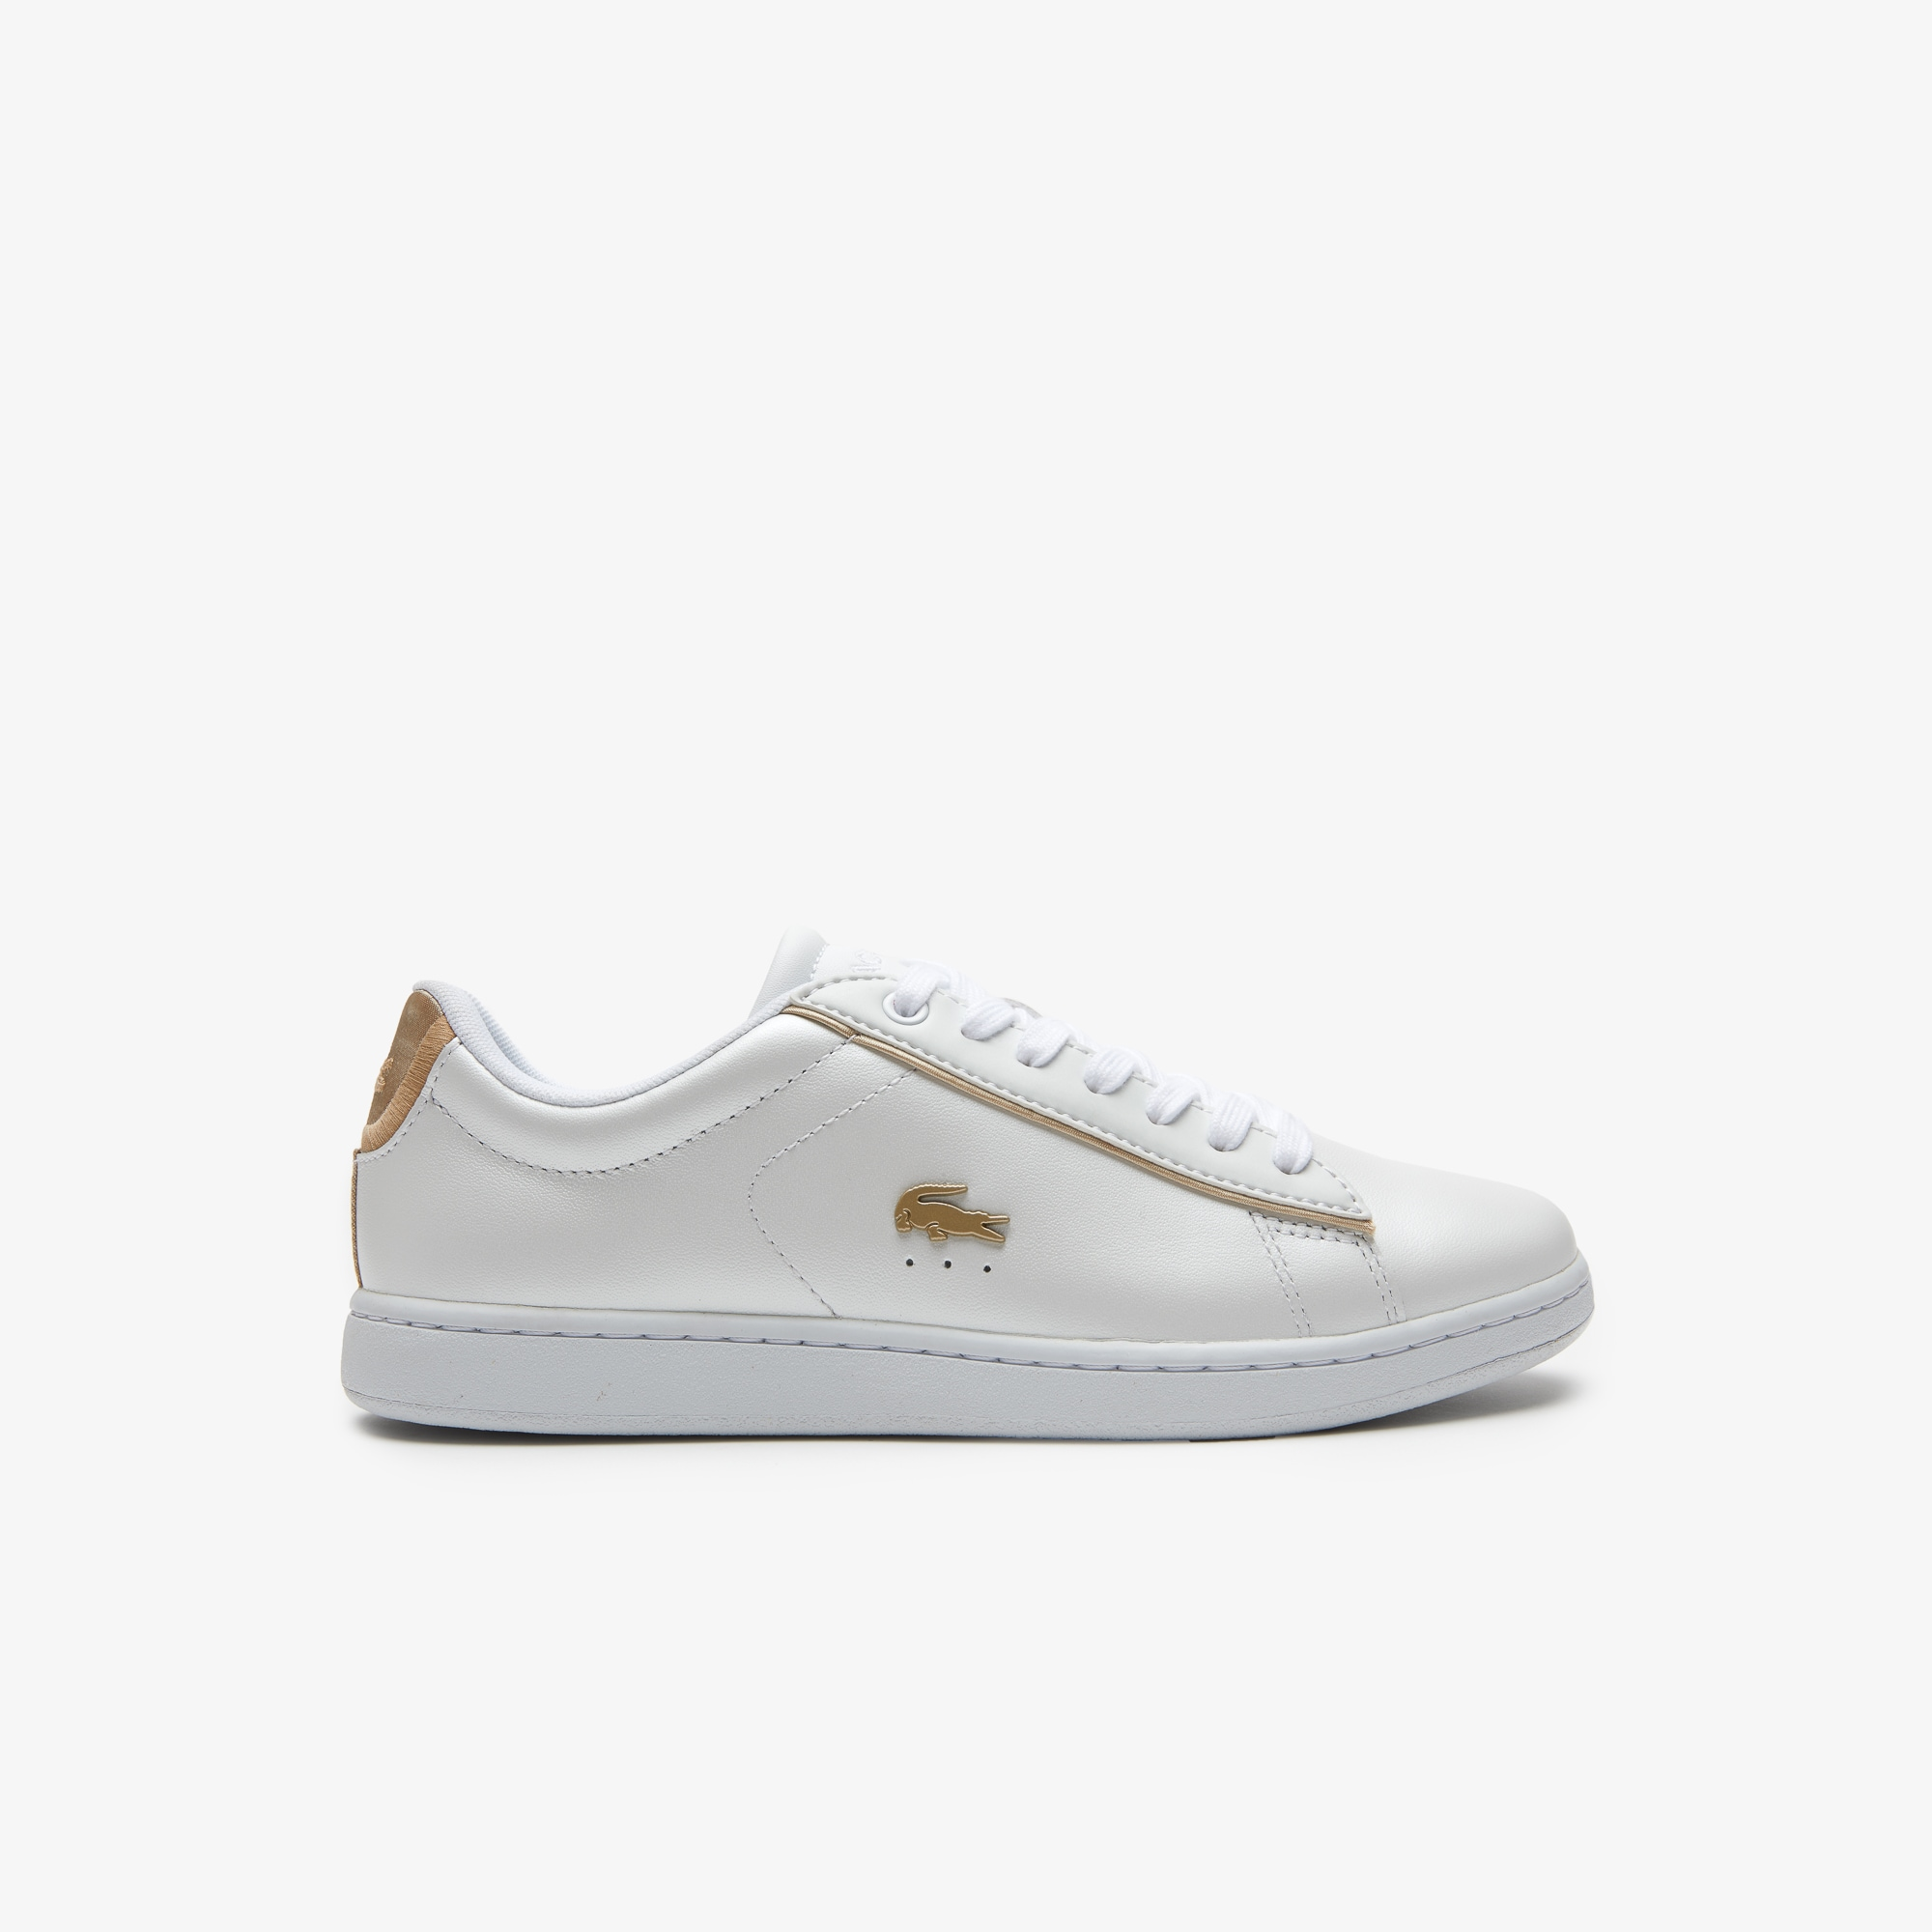 Sneakers Carnaby Evo in pelle madreperlata